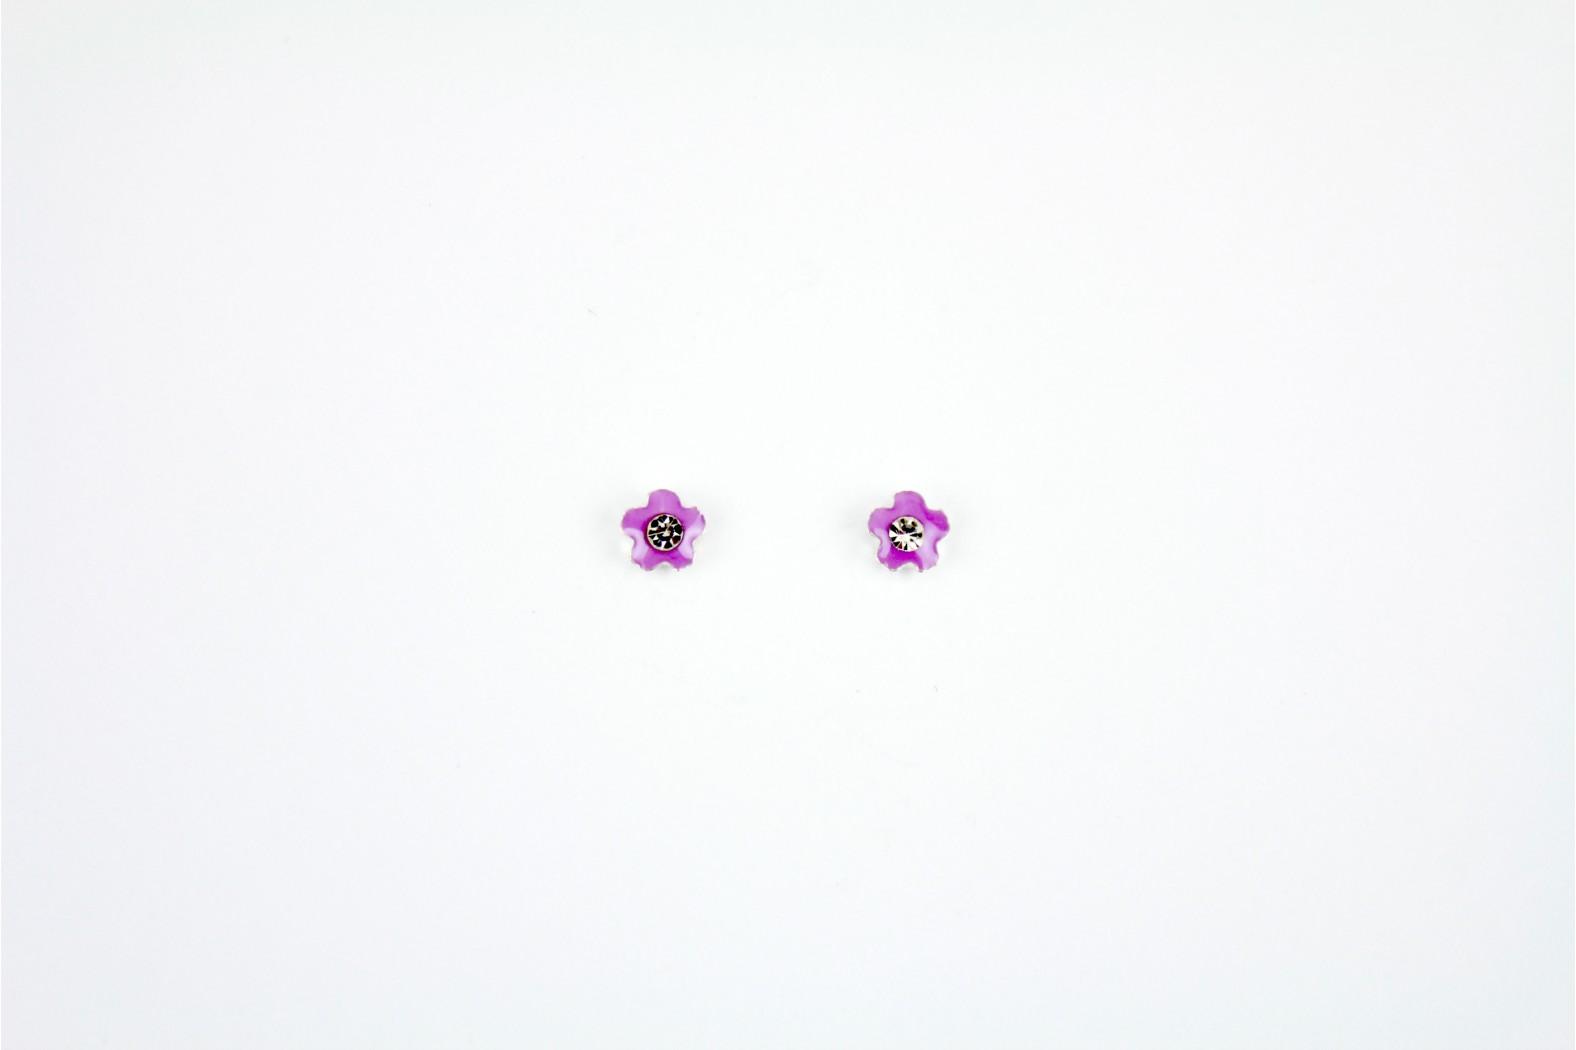 Daisy Purple Enamel with Crystal inlay stud earrings